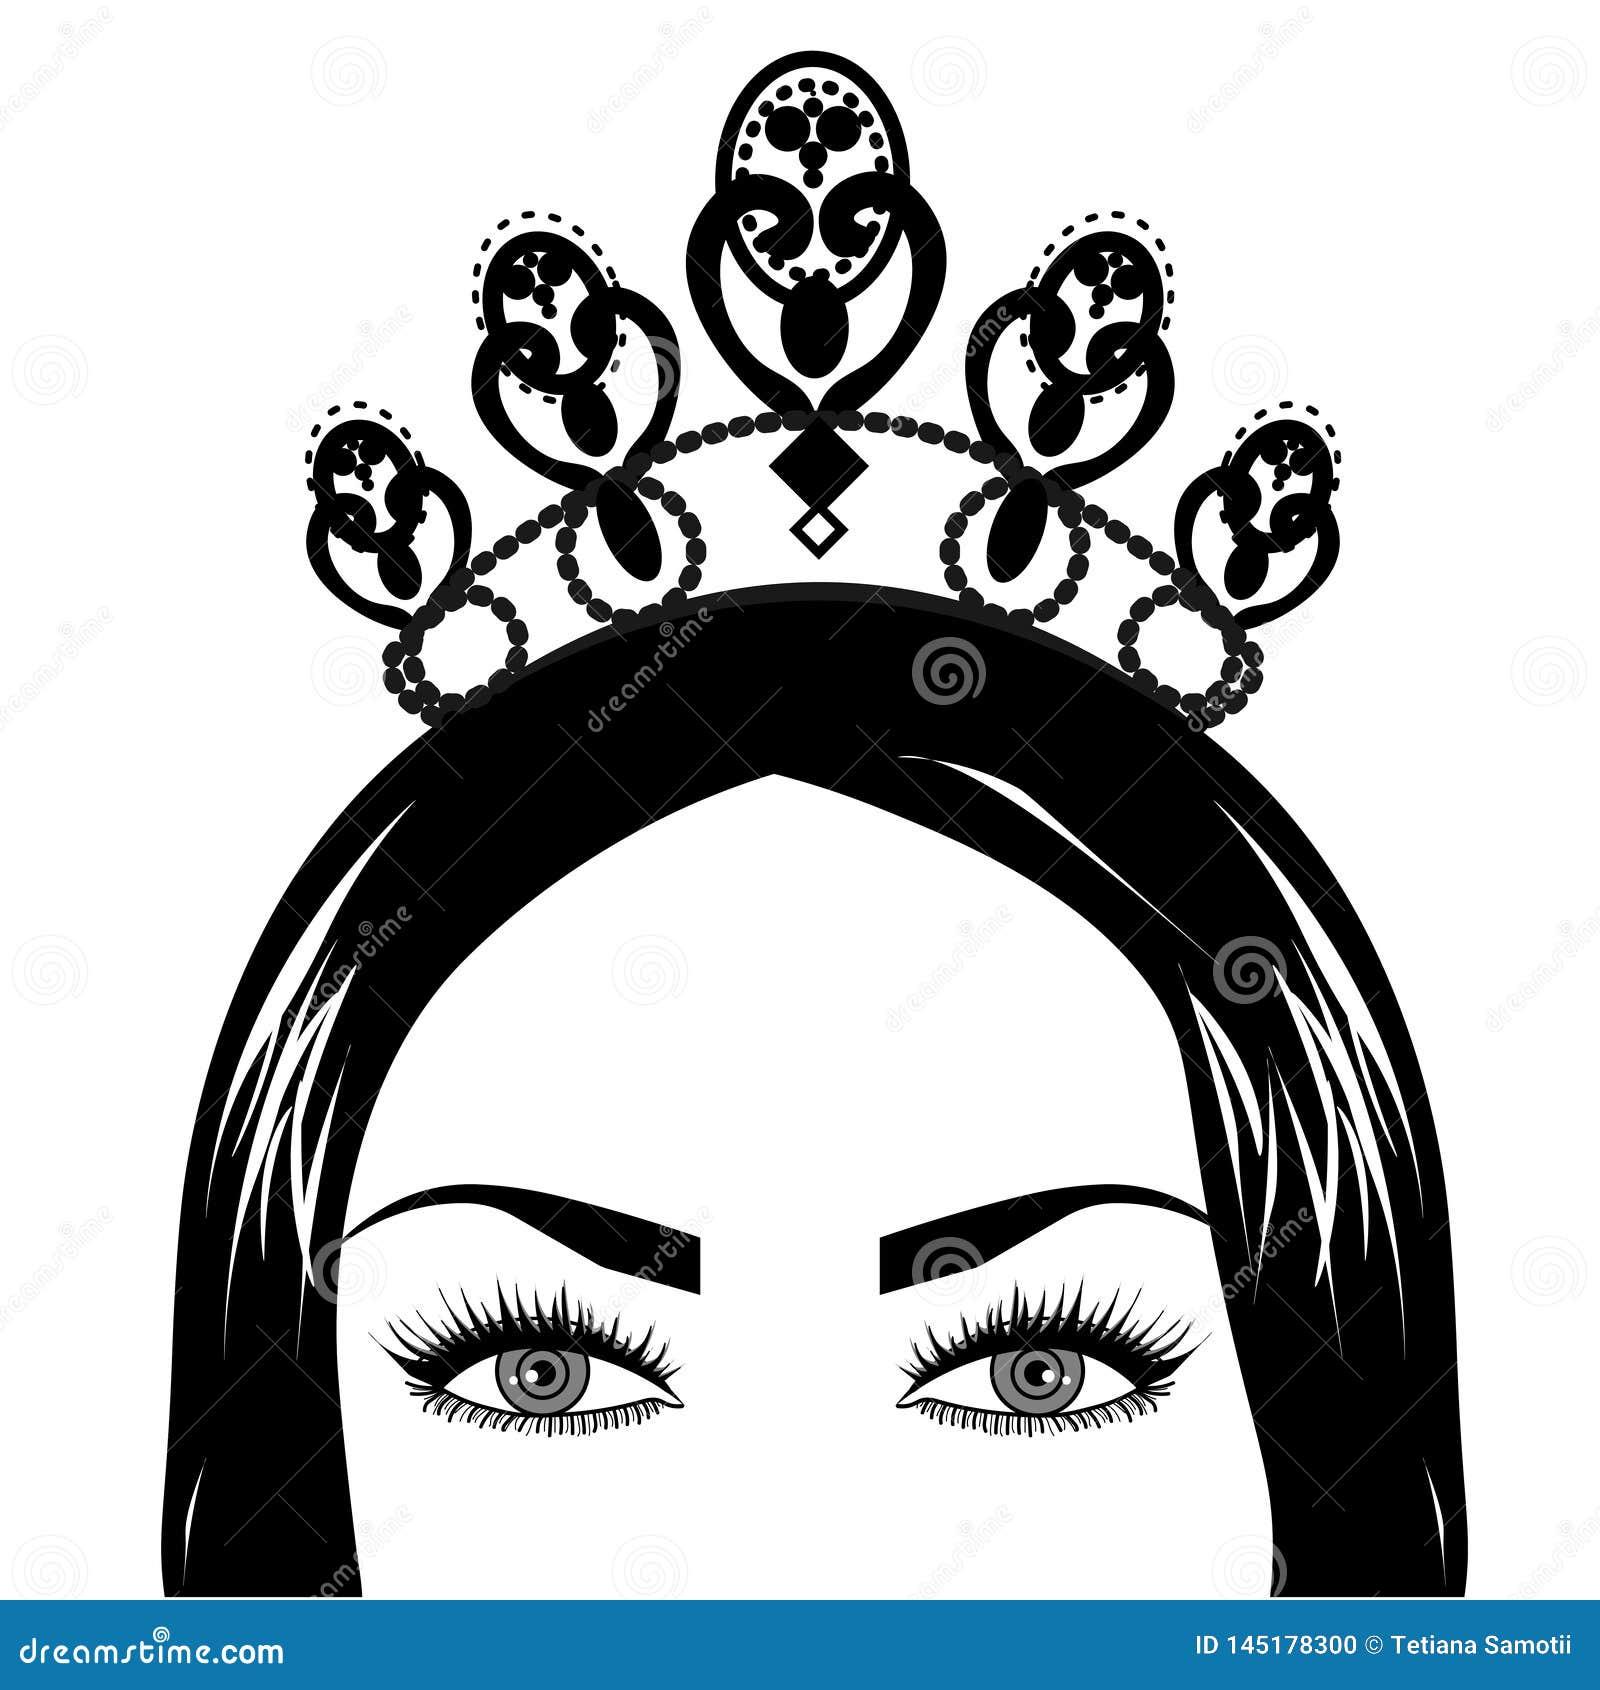 Logotipo da rainha e da coroa da Web